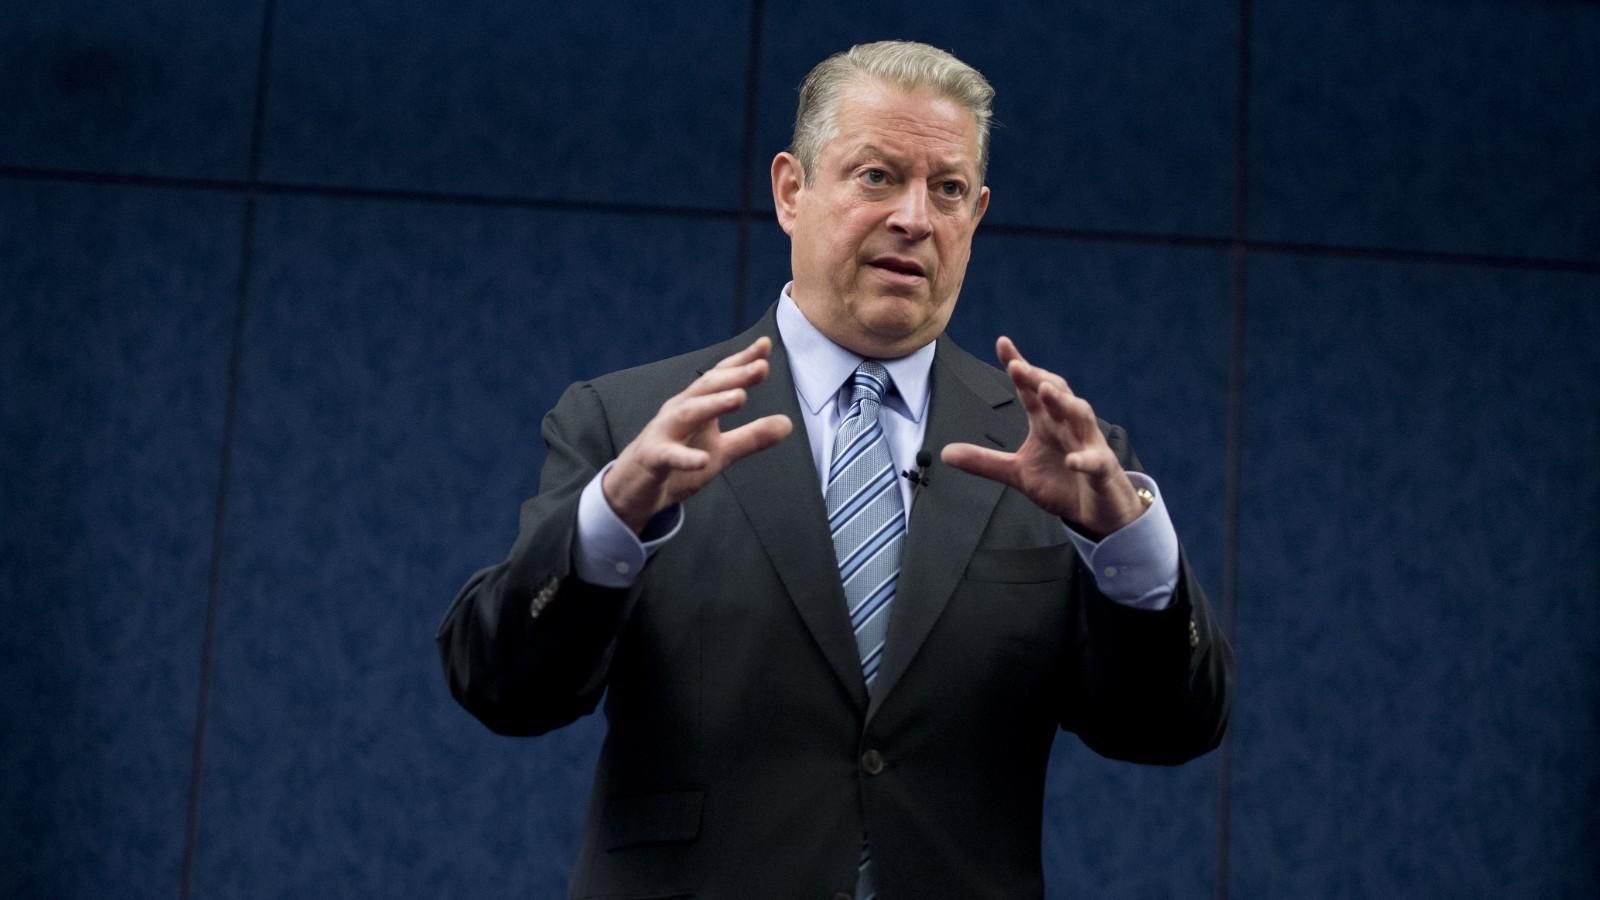 Al Gore: 'I Invented the Internet'